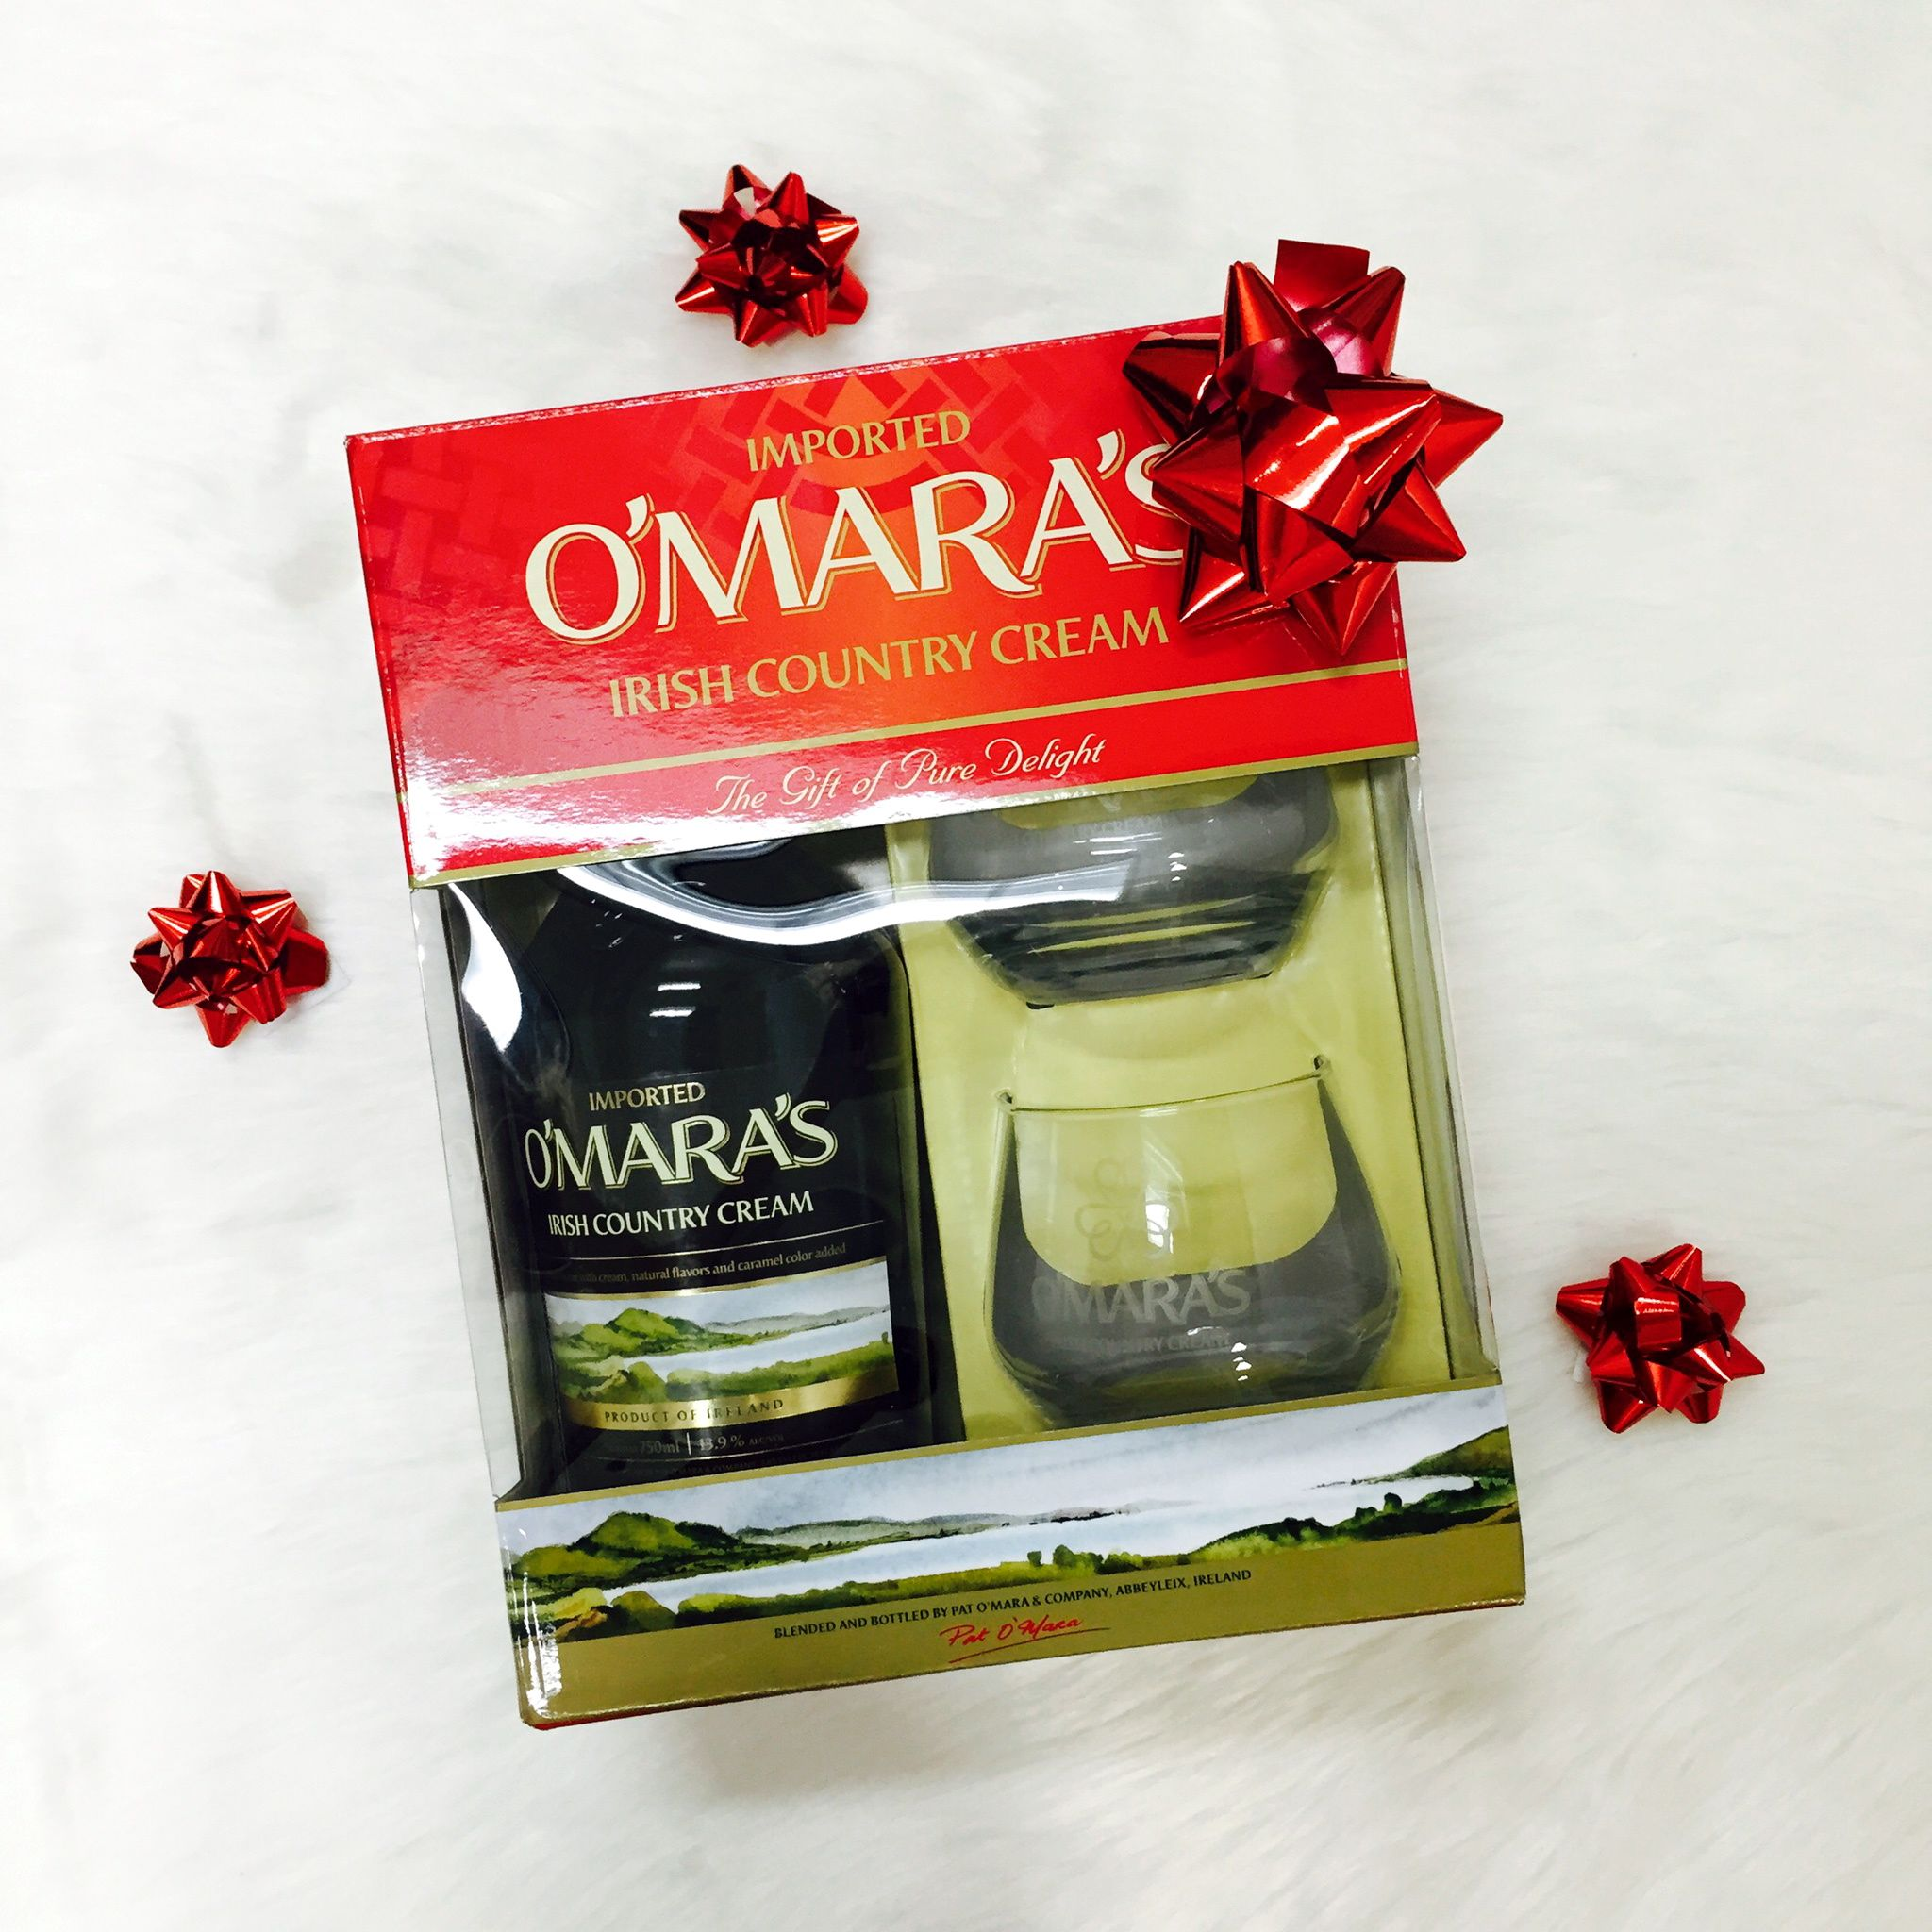 For the drinker omaras irish country cream gift set